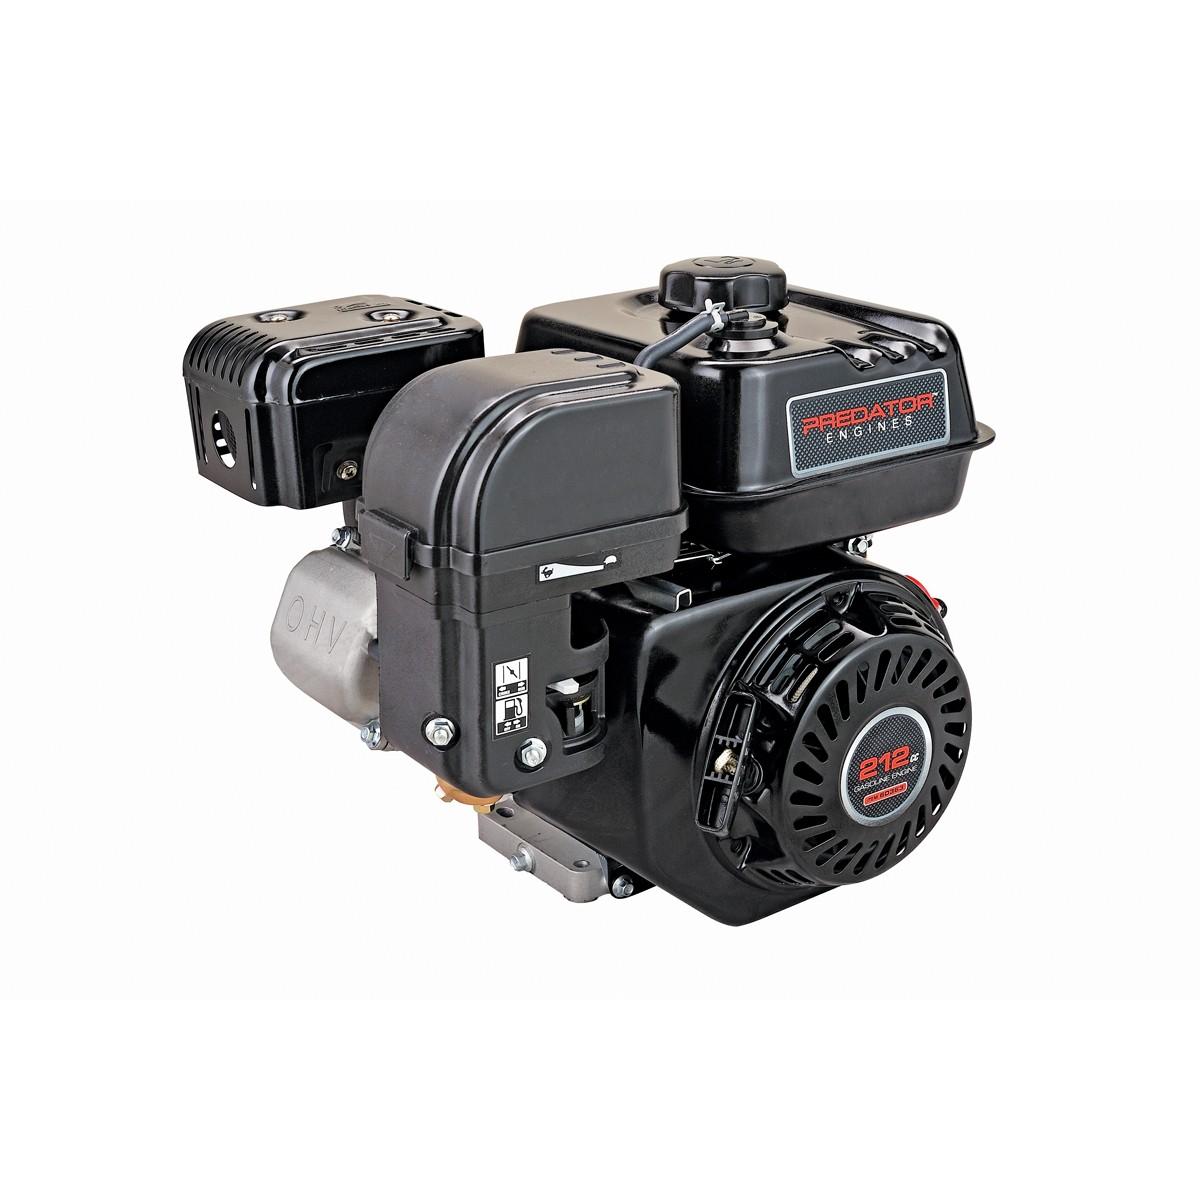 HEMI - 6.5 HP (212cc) OHV Horizontal Shaft Gas Engine EPA $100